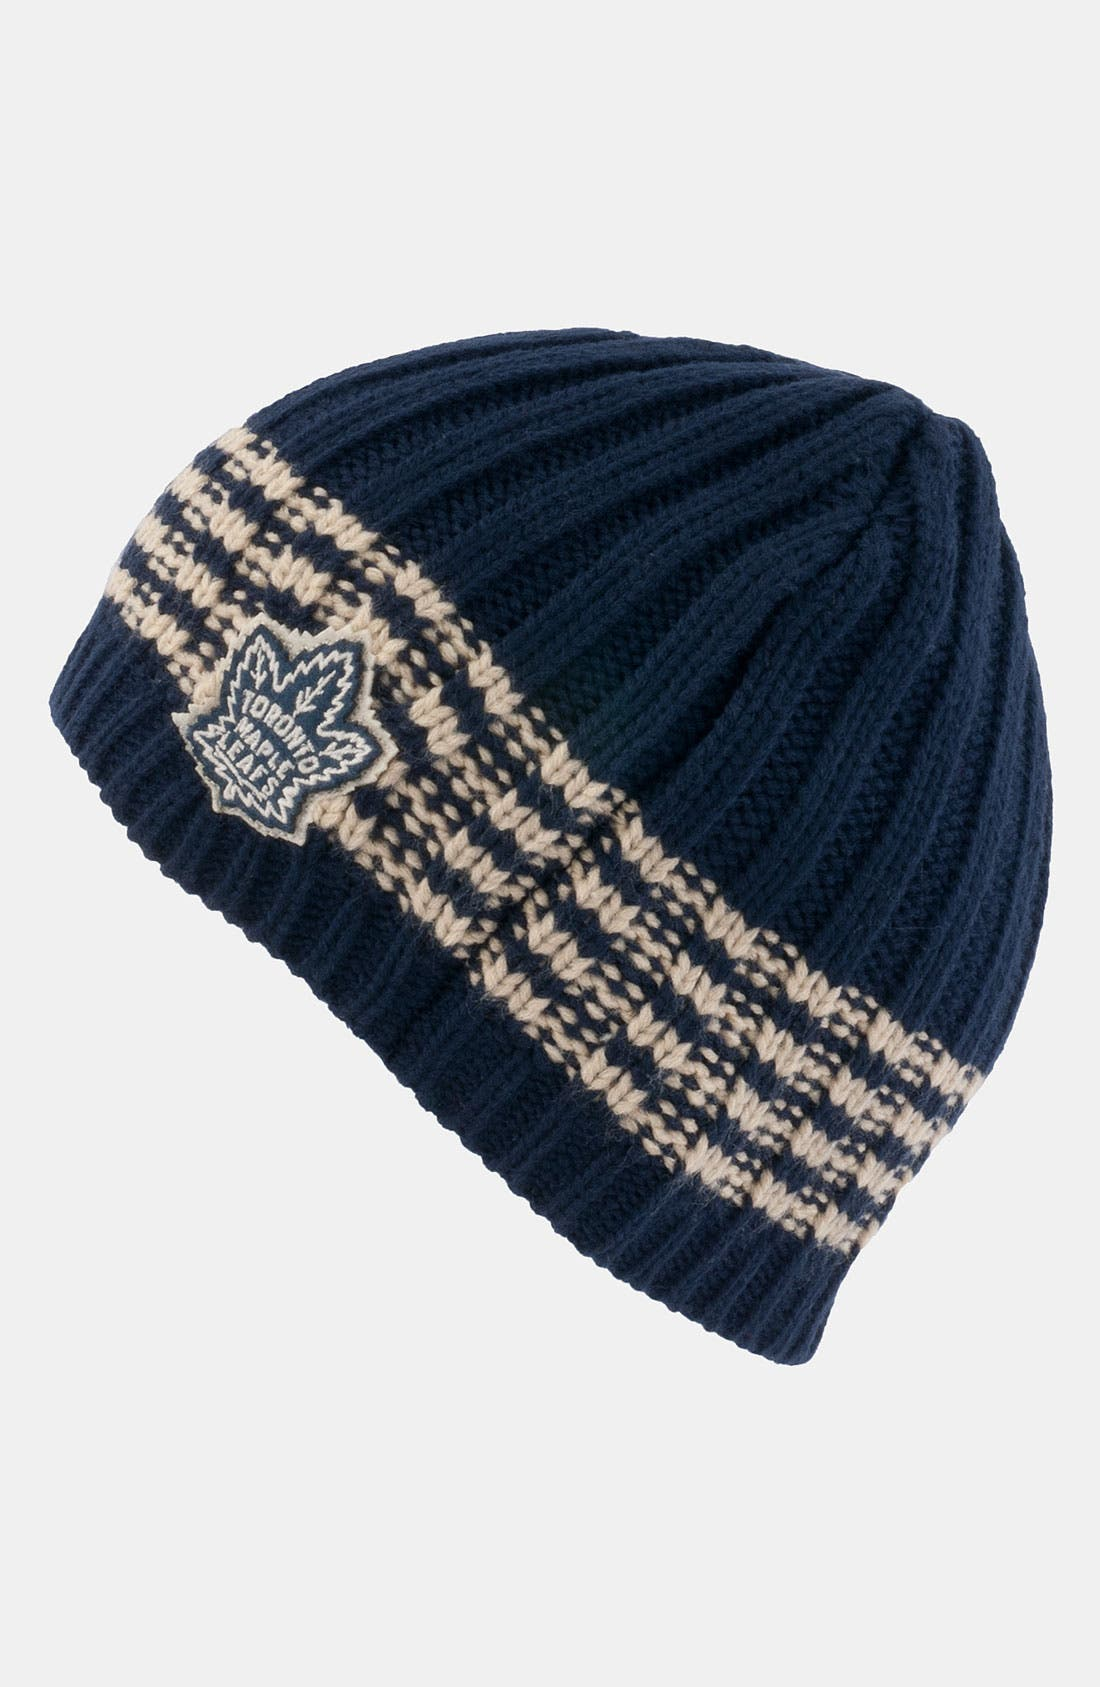 Main Image - American Needle 'Toronto Maple Leafs - Targhee' Knit Hat